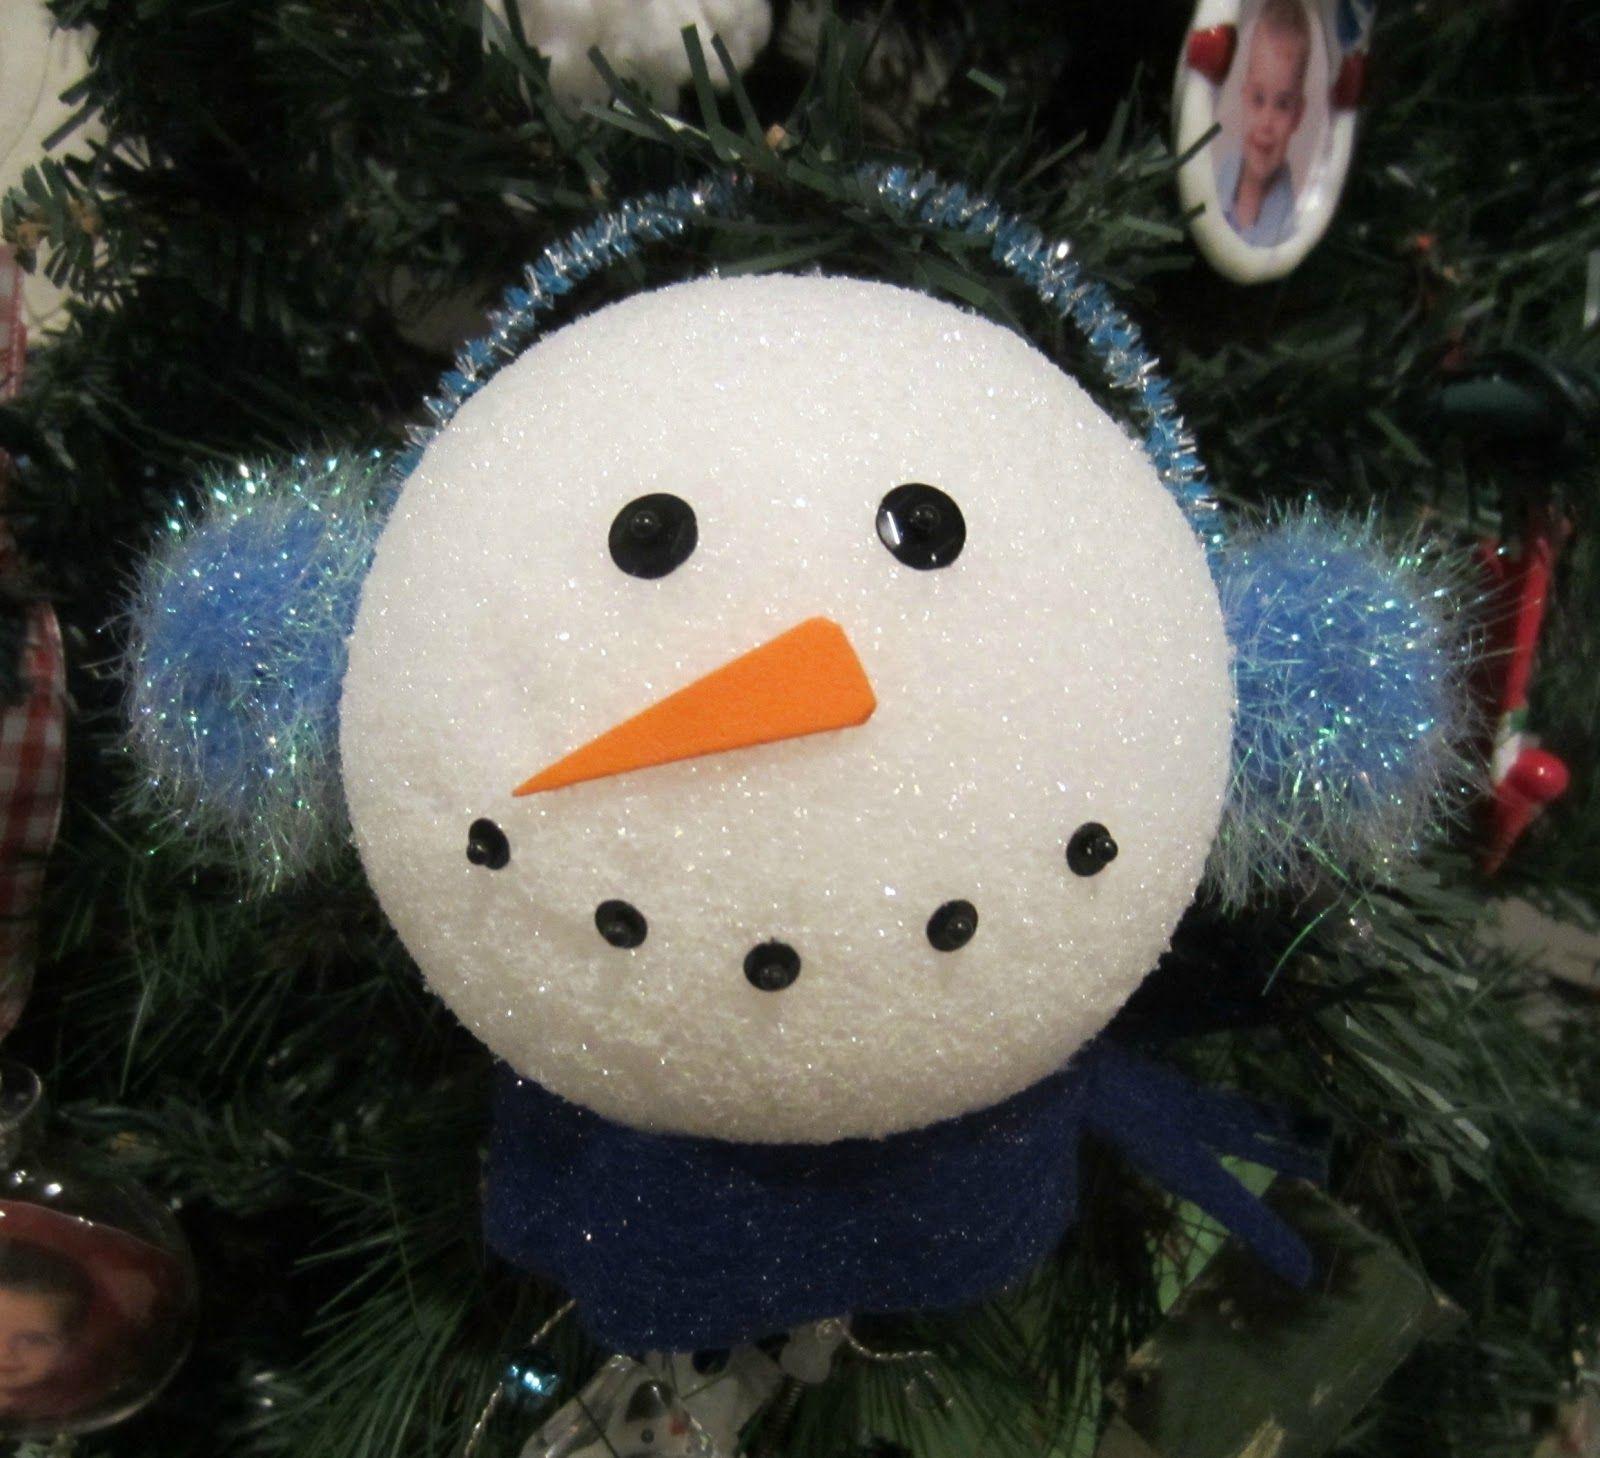 Making A Snowman That Doesn T Melt